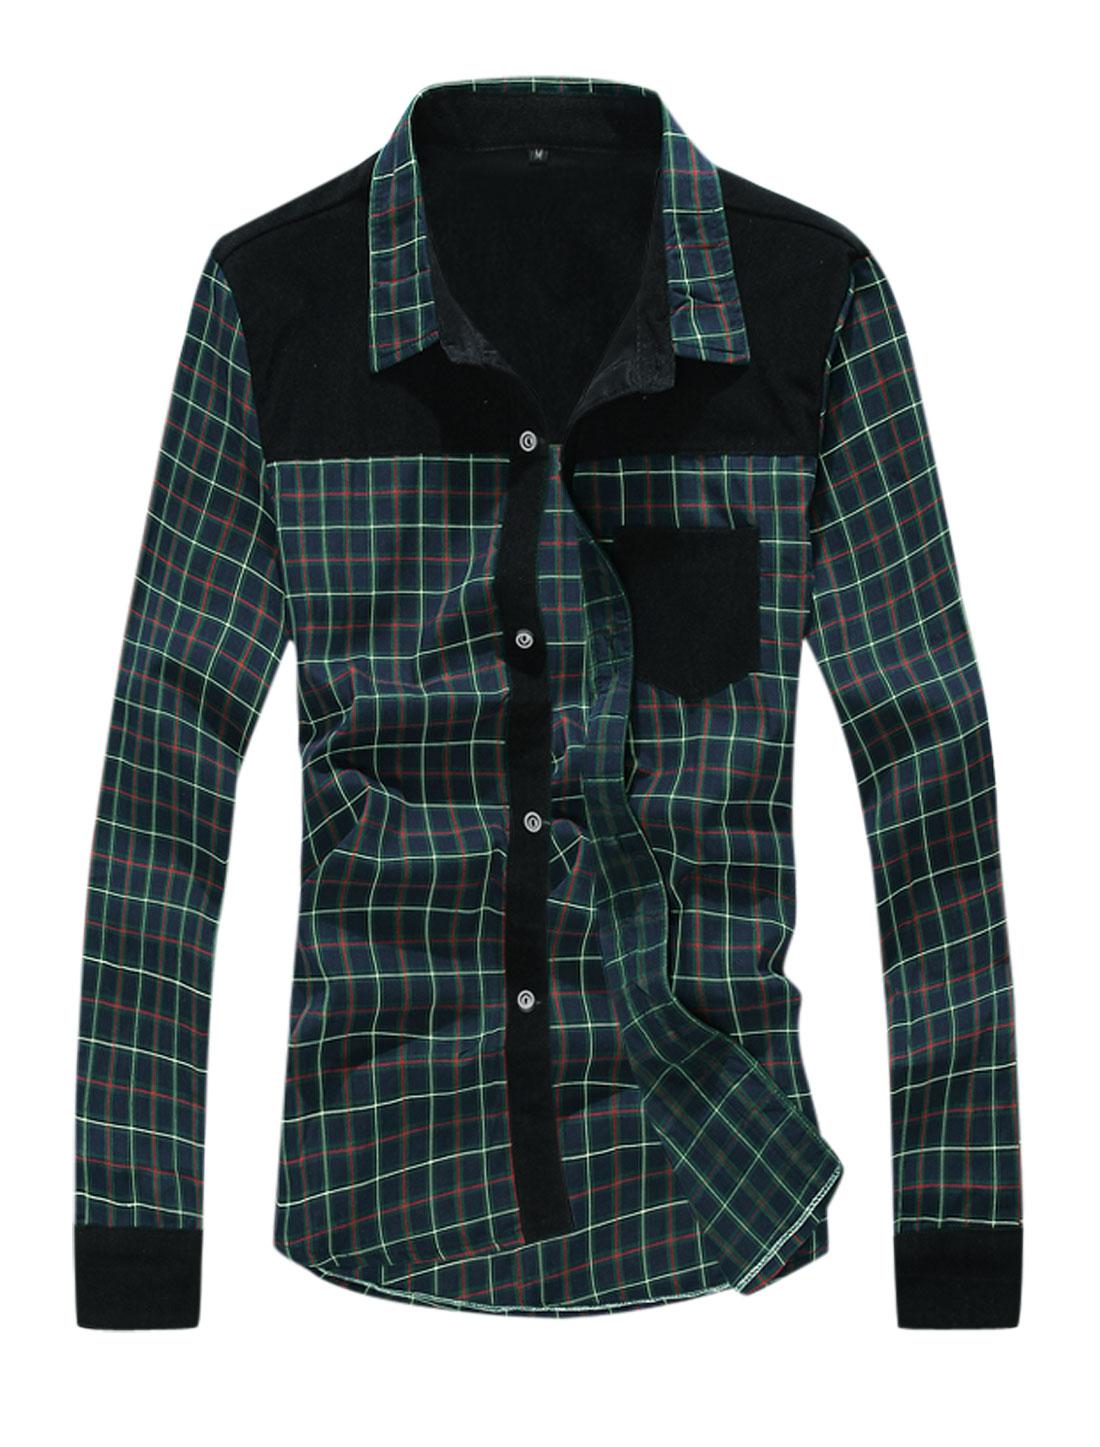 Men Checkered Pattern Corduroy Panel Chest Pocket Shirt Green Navy Blue M